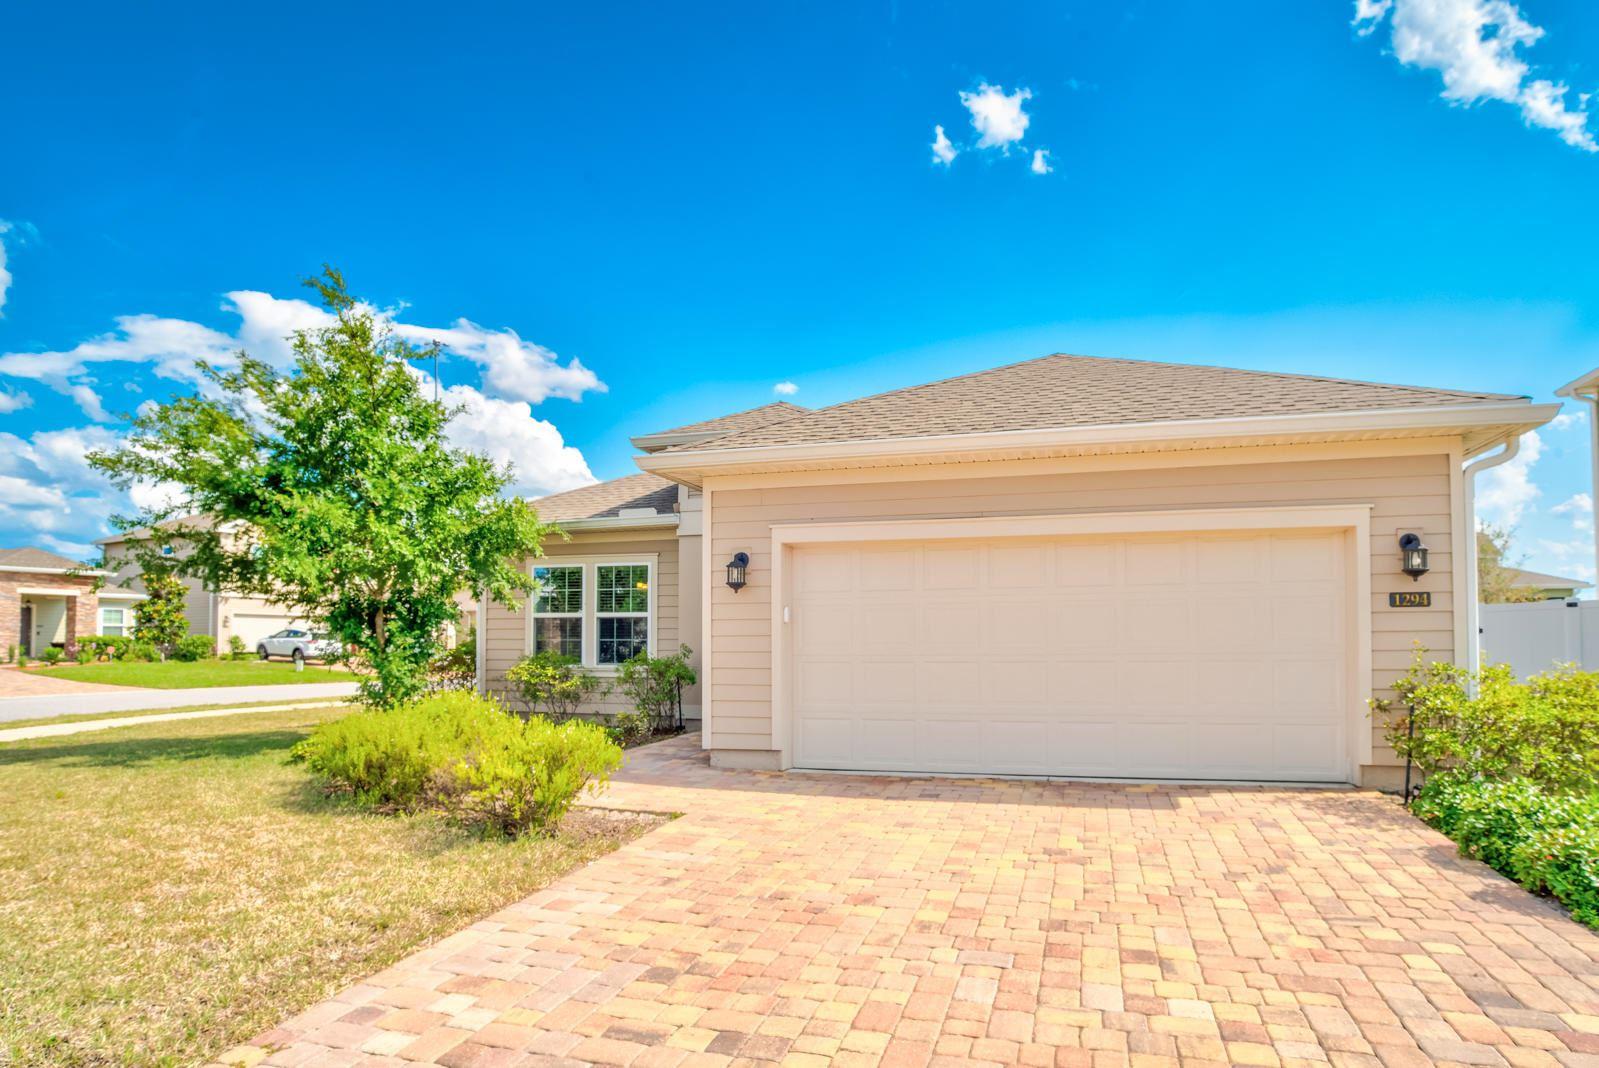 1294 KENDALL DR #Lot No: 69-1 13-2S-, Jacksonville, FL 32211 - MLS#: 1108959